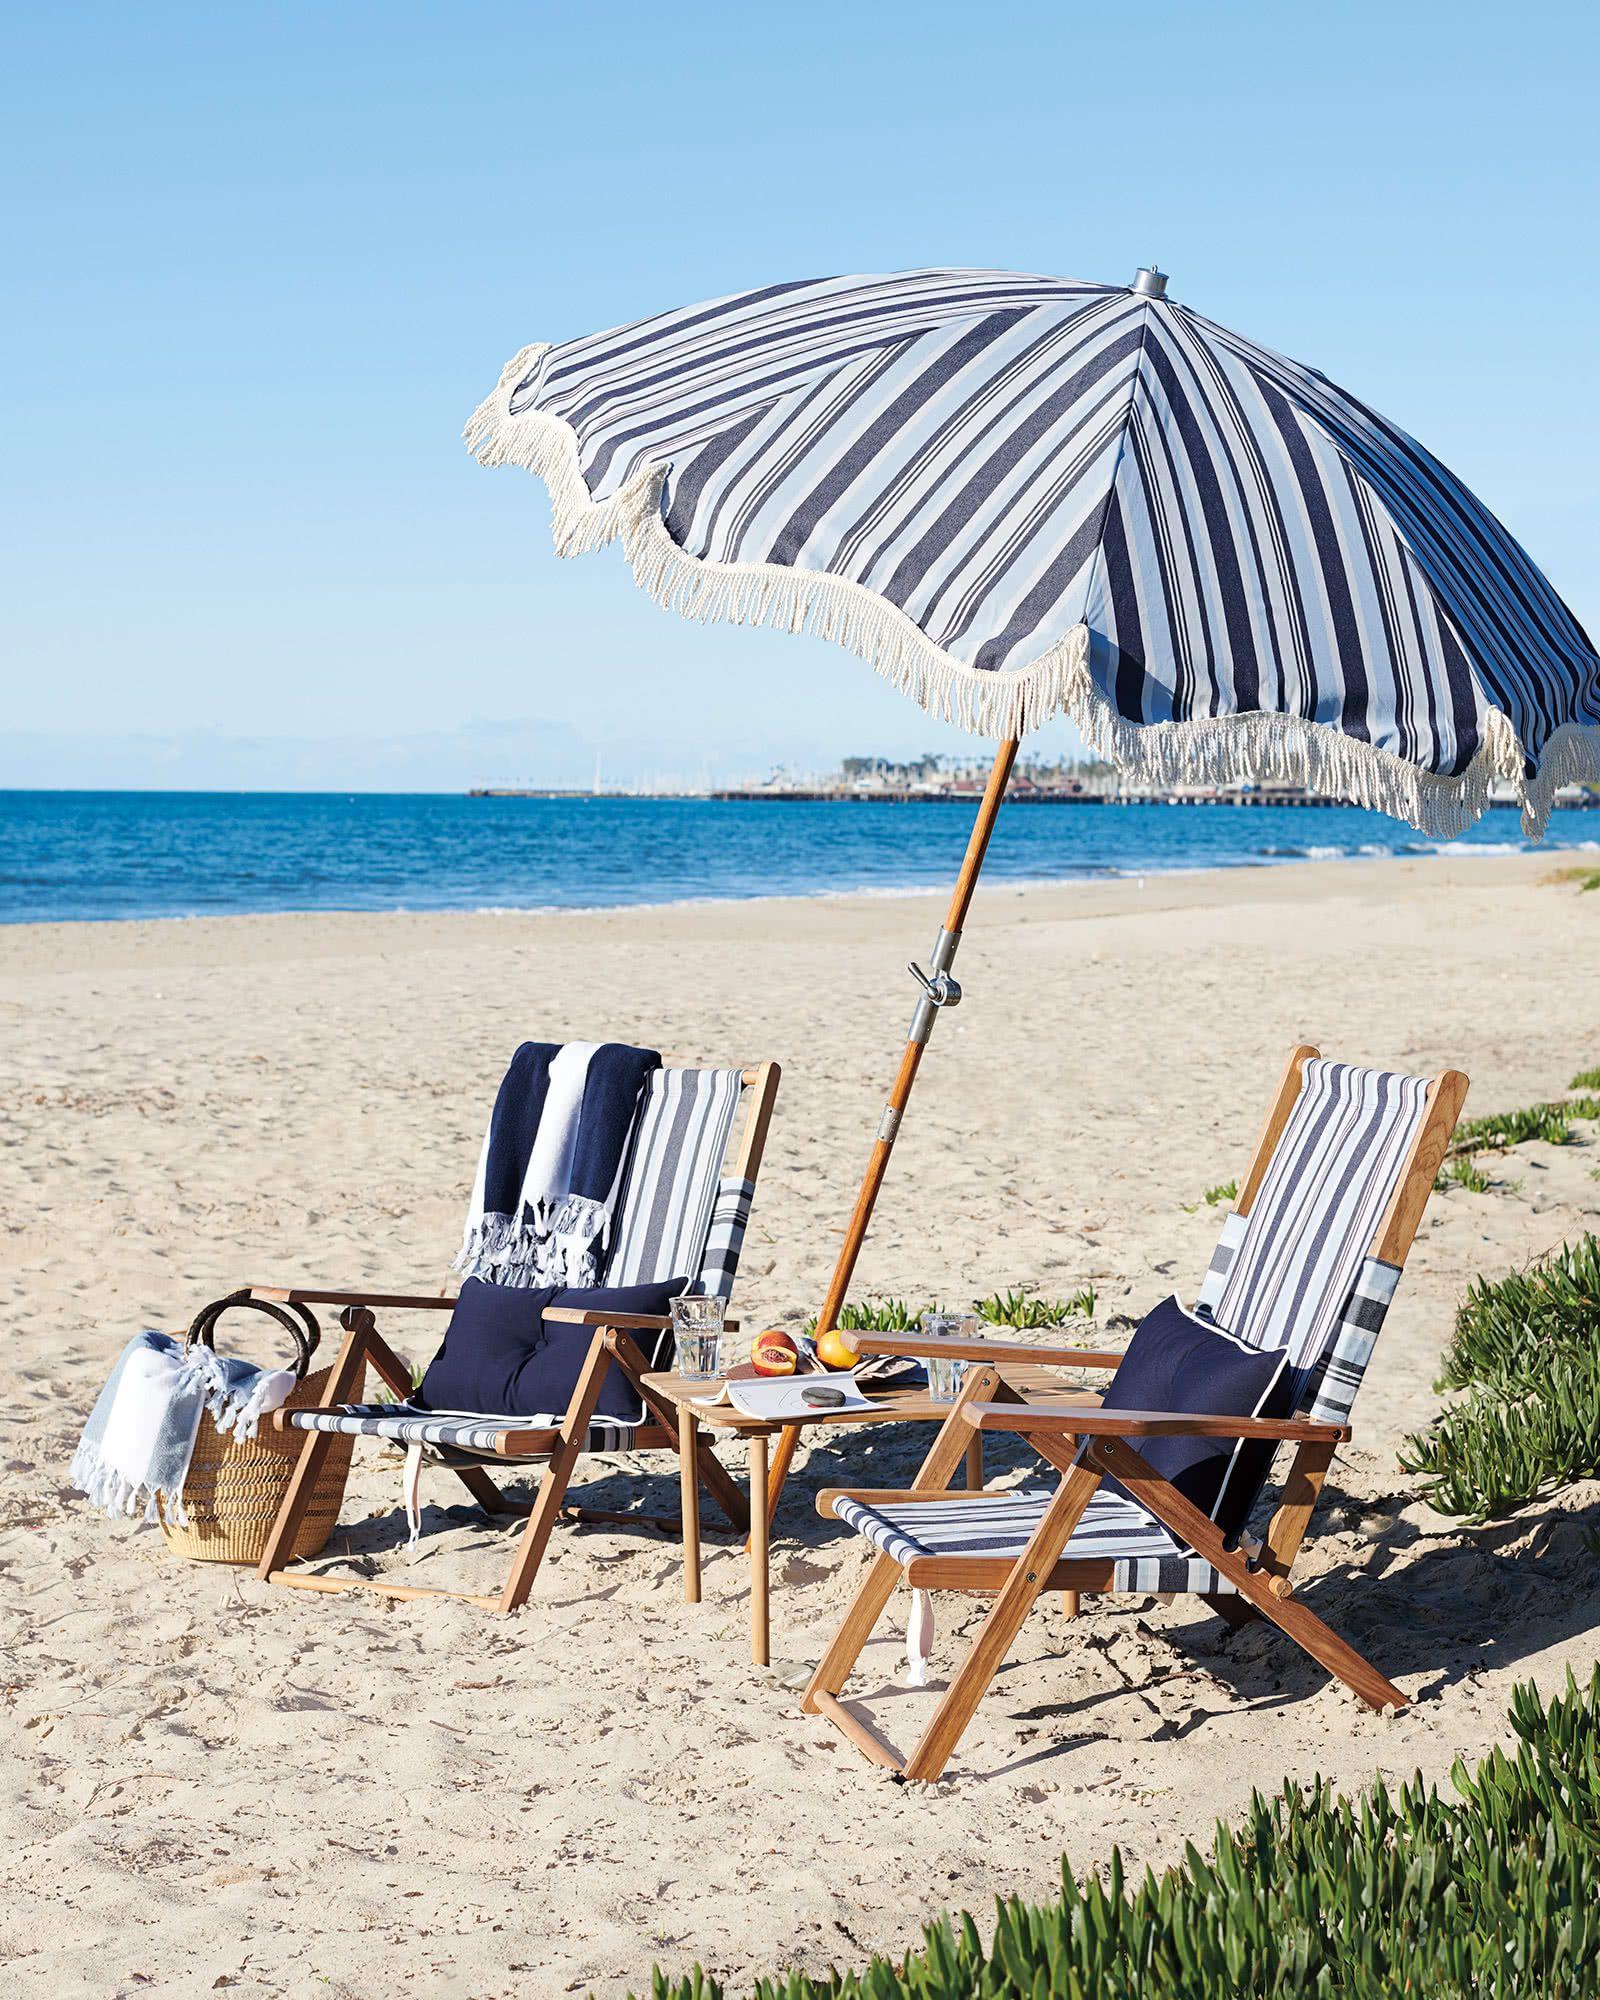 Decorative Beach Chair Towels Design